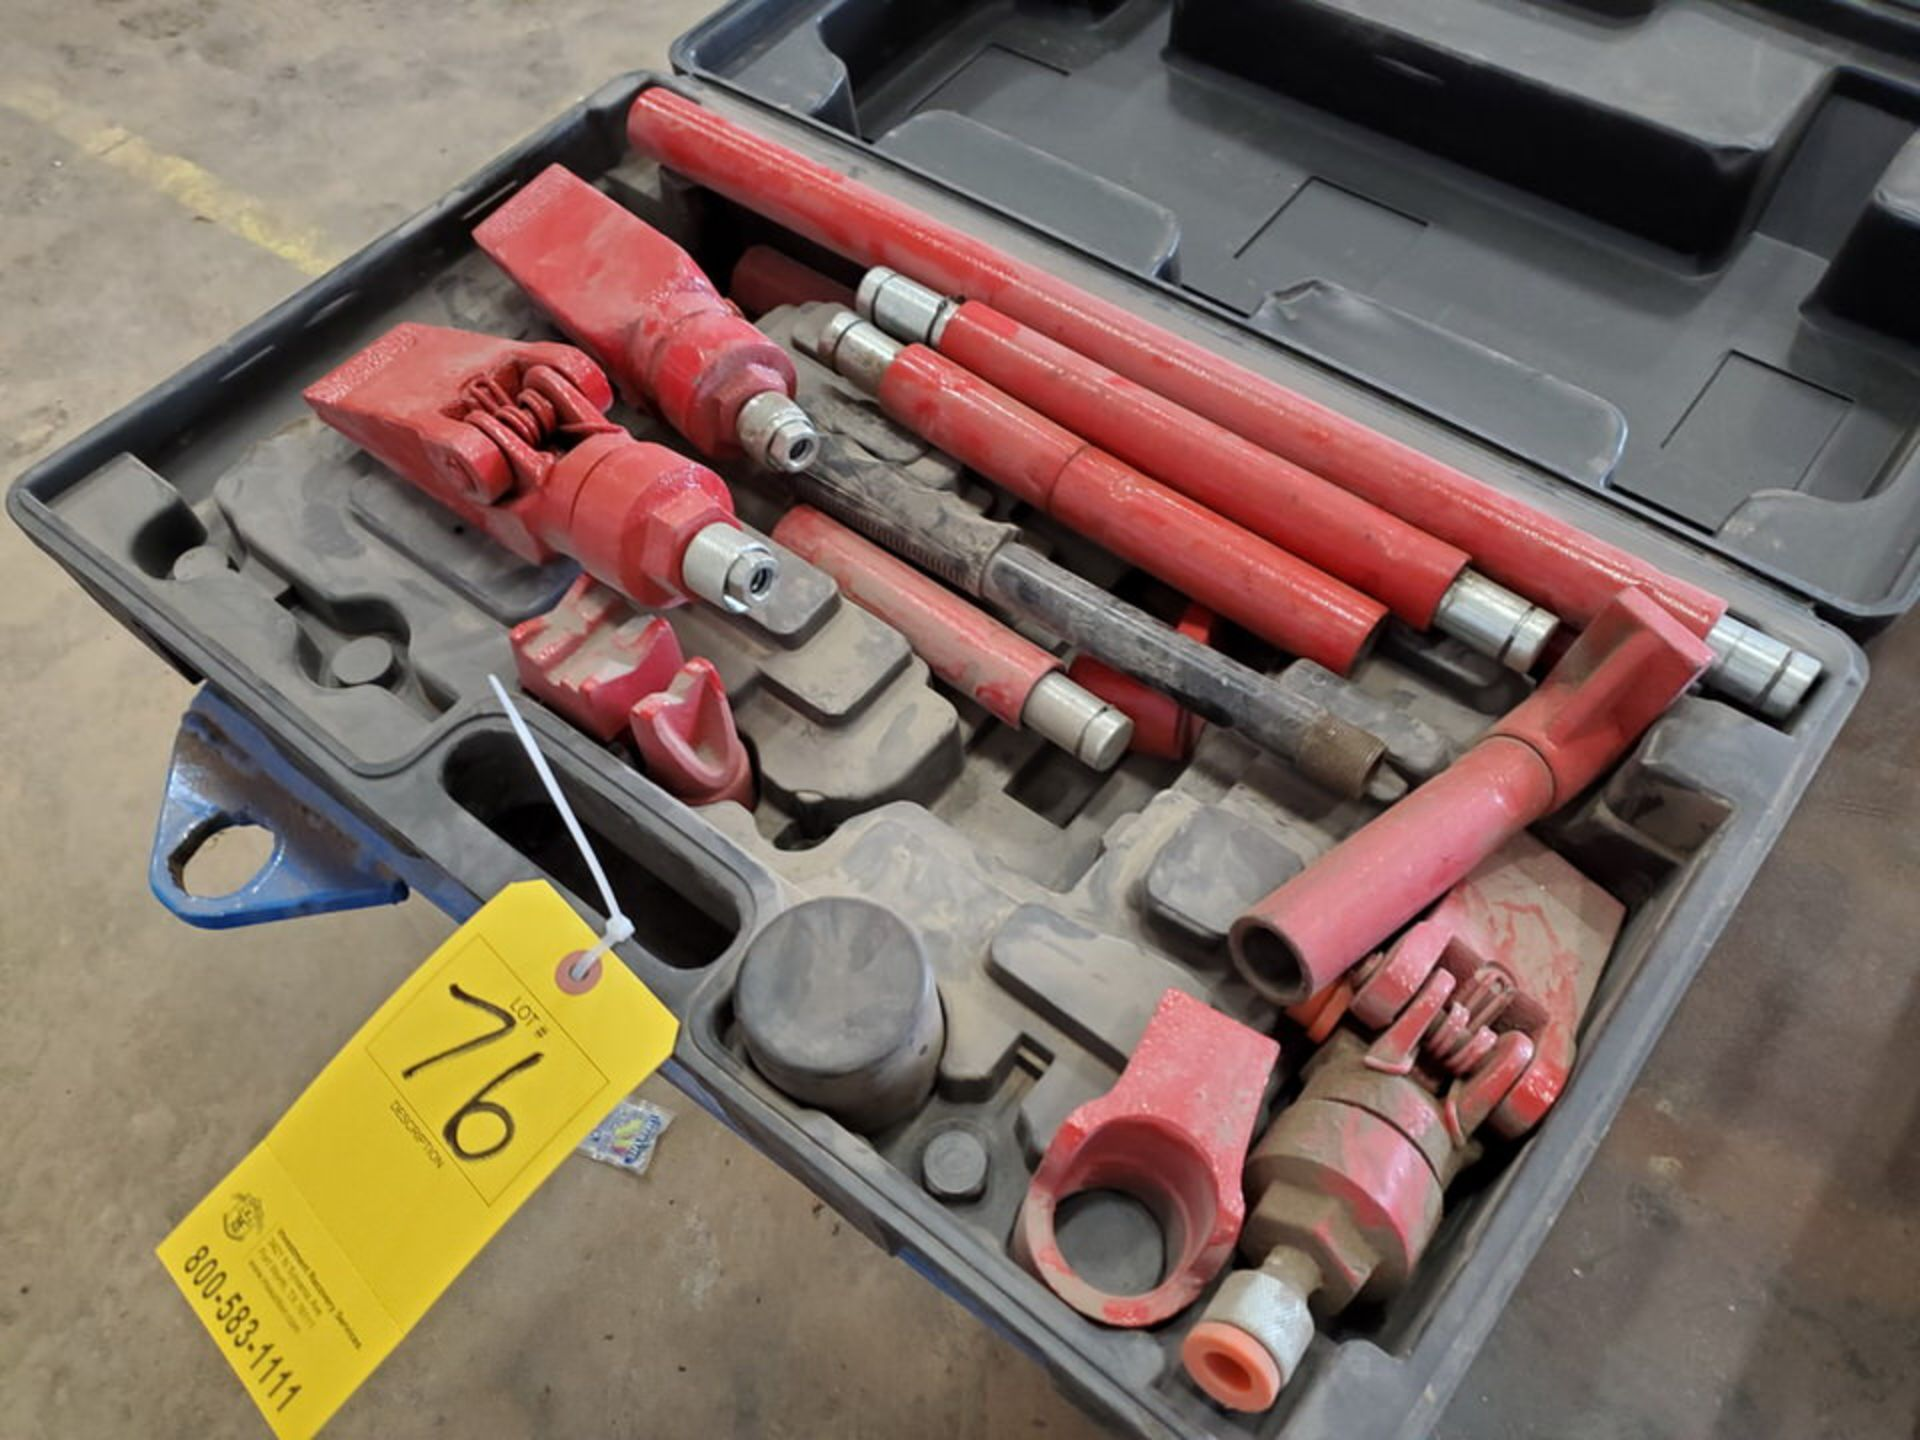 Proto 4 Ton Hydraulic Body Repair Kit - Image 2 of 4